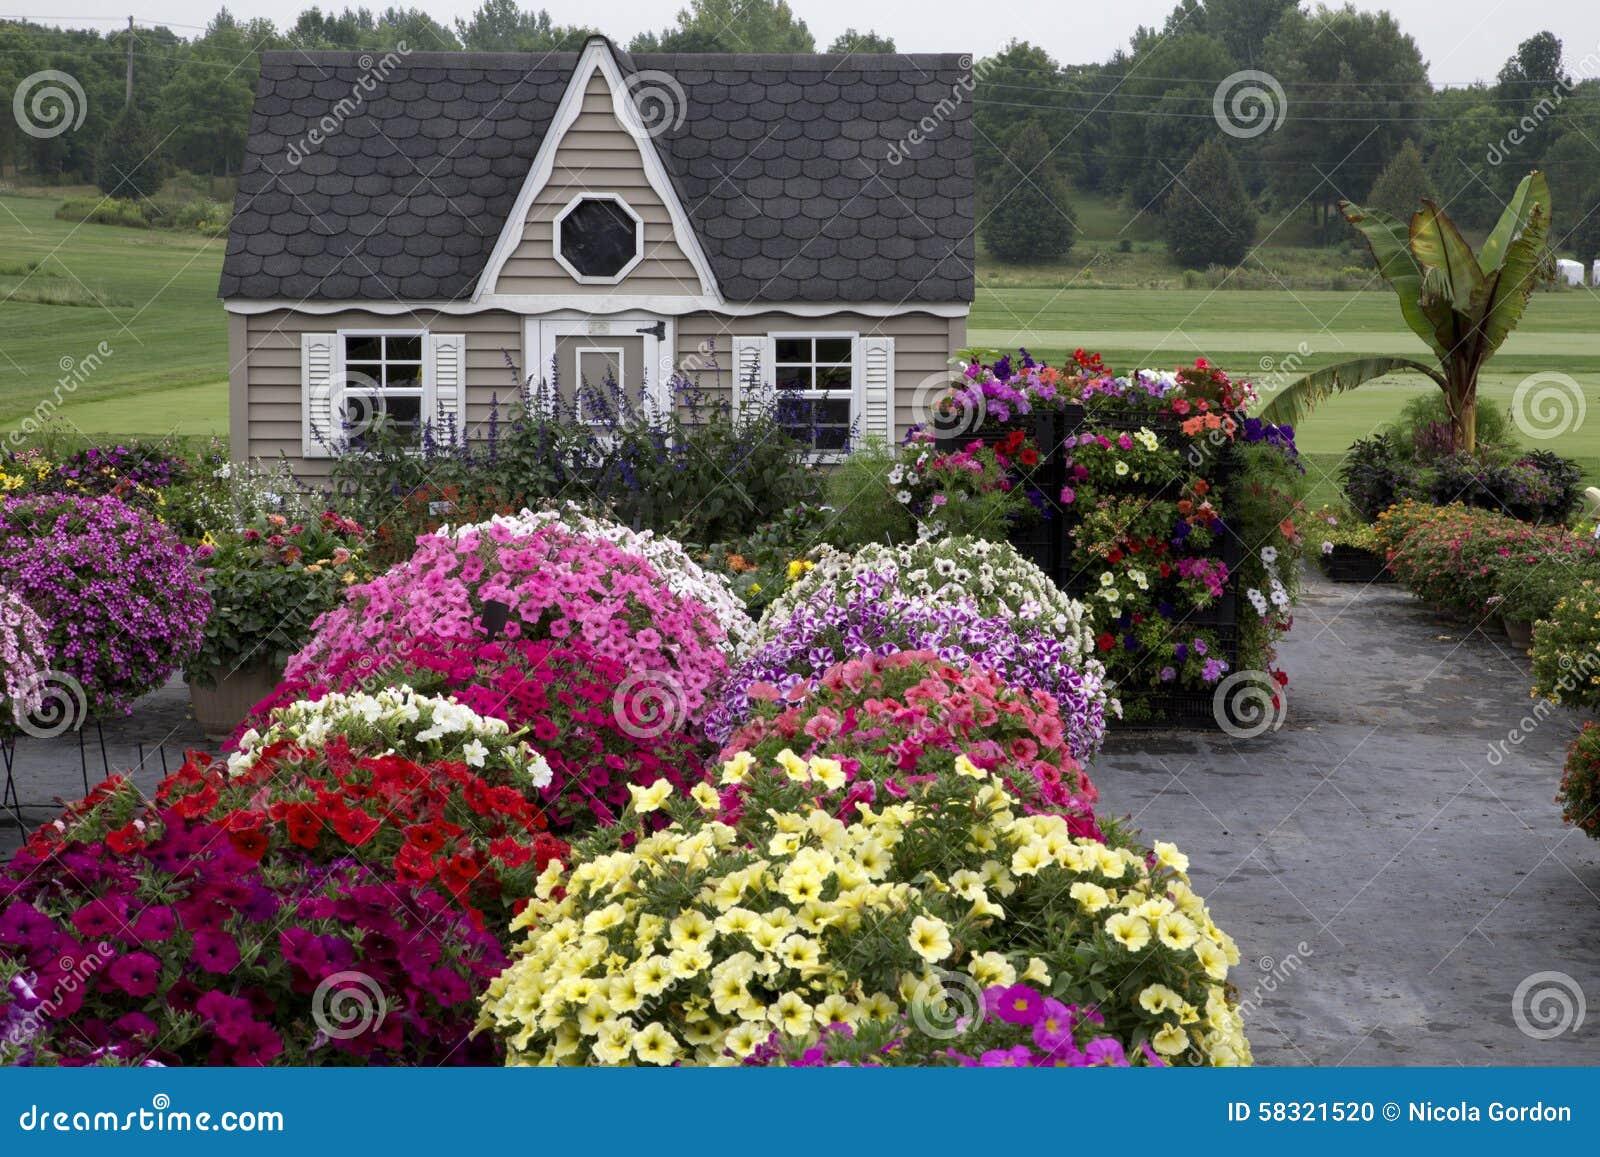 Beautiful garden with profusion of flowers stock photo image of download beautiful garden with profusion of flowers stock photo image of lawn shed izmirmasajfo